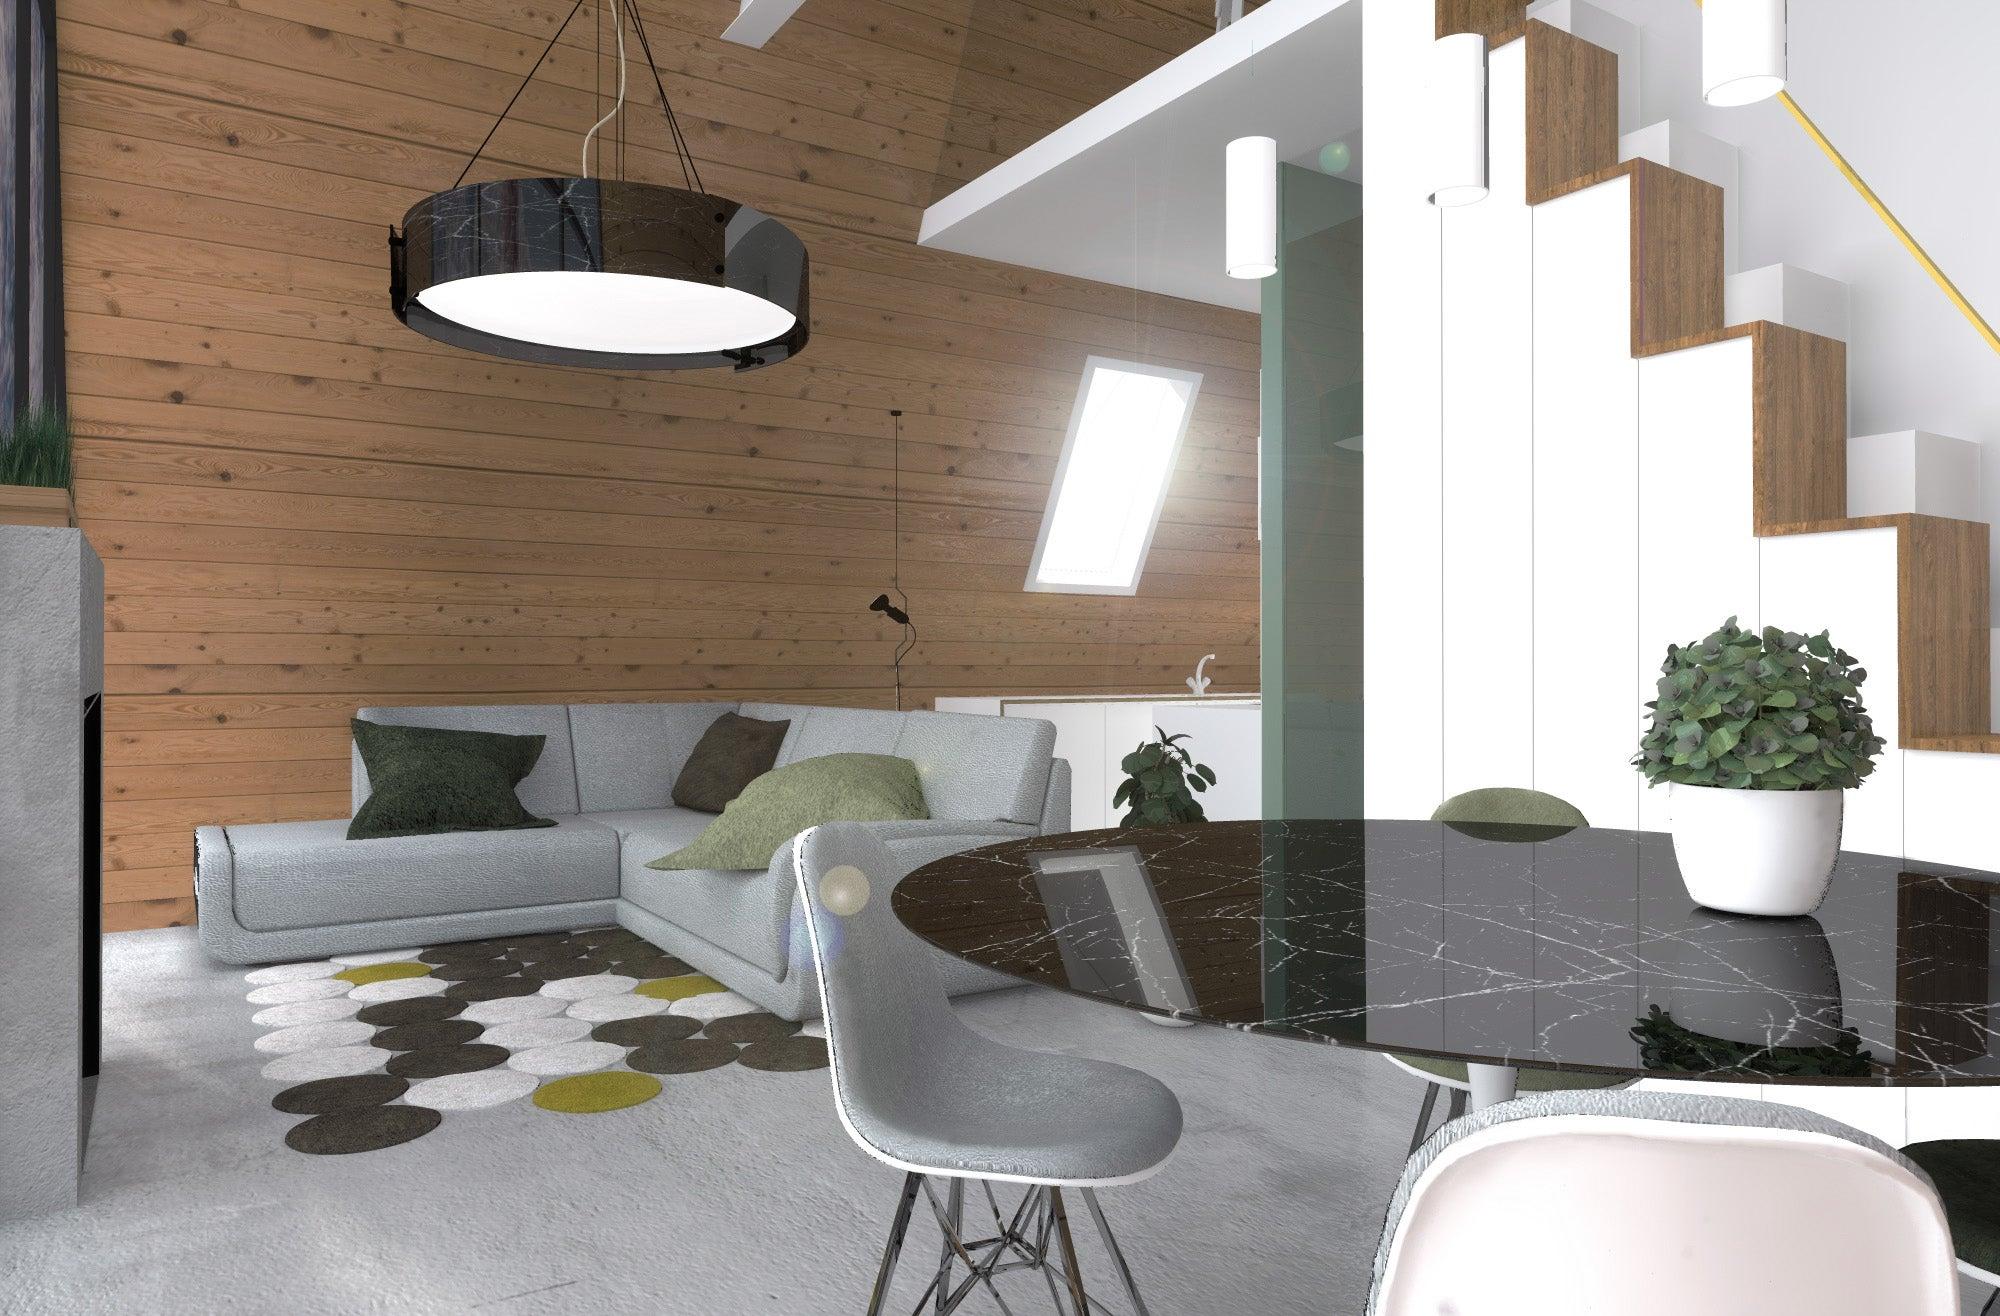 New Concrete Home Design Html on funeral home building design, new home design plans, exterior home design, concrete home plan design, modern home design,